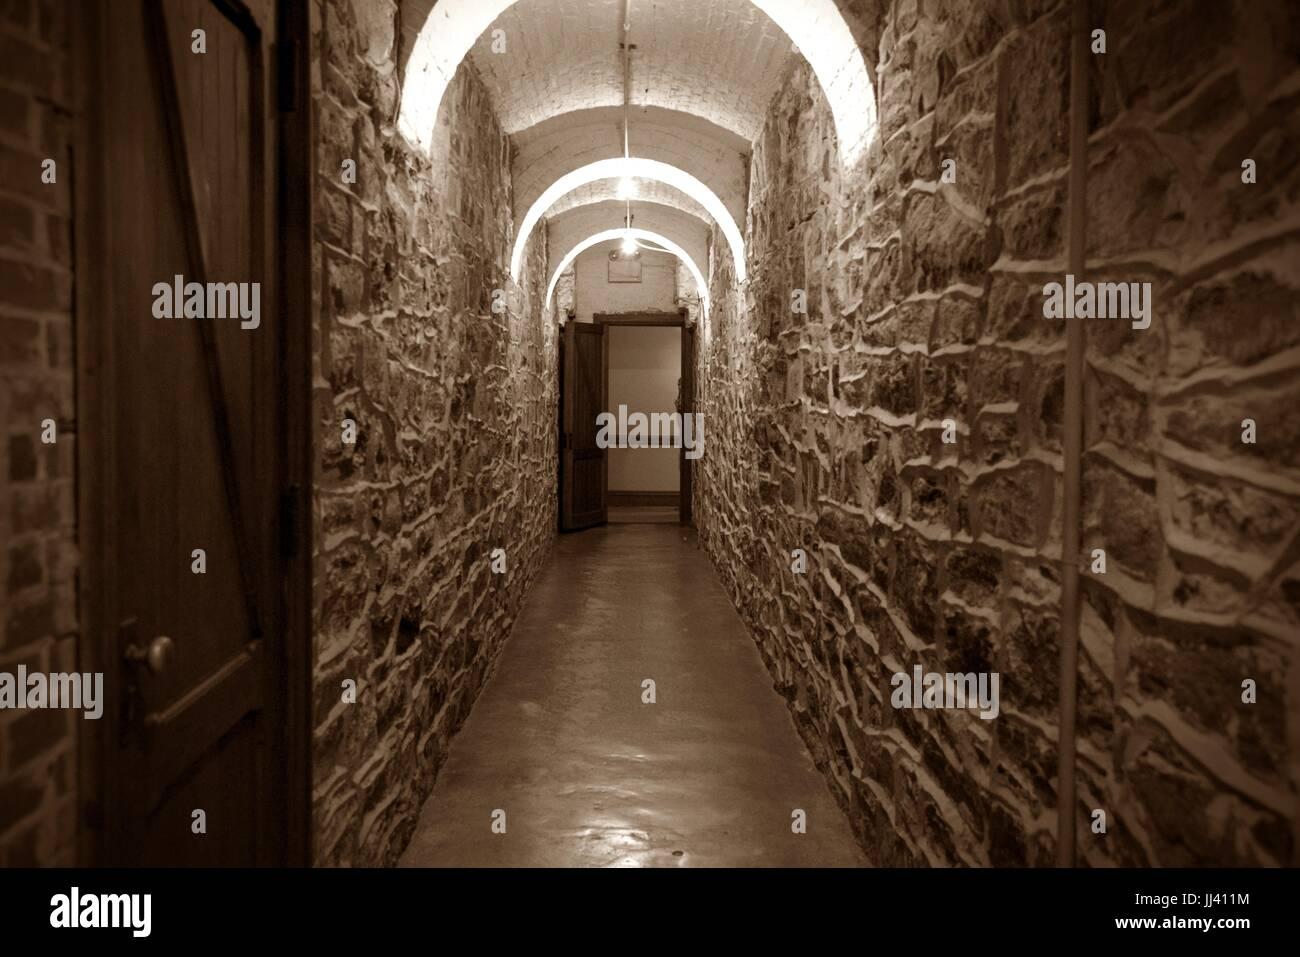 Hallway in Biltmore Estate basement - Stock Image